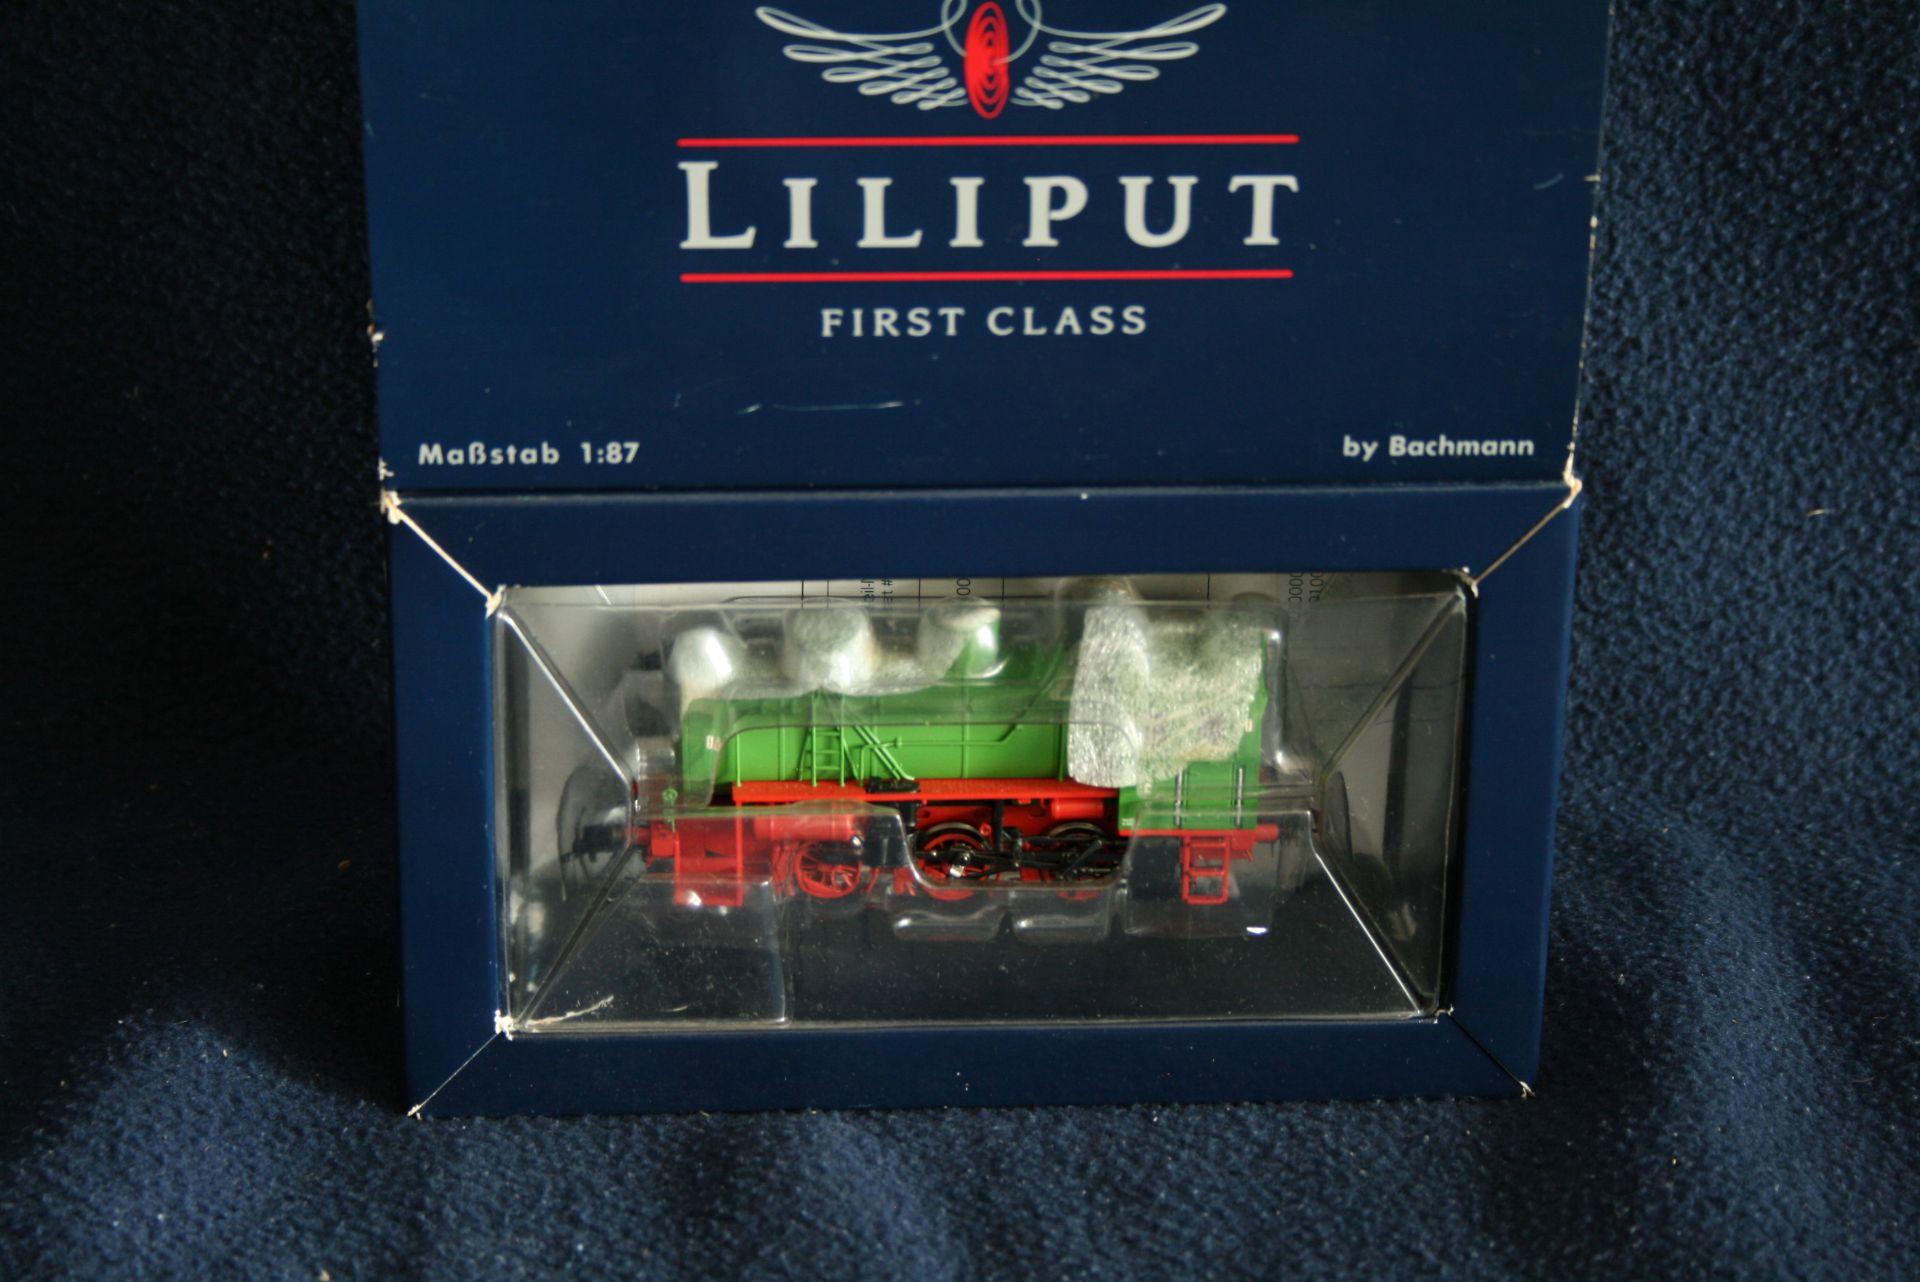 Los 57 - LILIPUT HO - L103000, boîte d'origine - - LILIPUT HO - L103000, original package - [...]